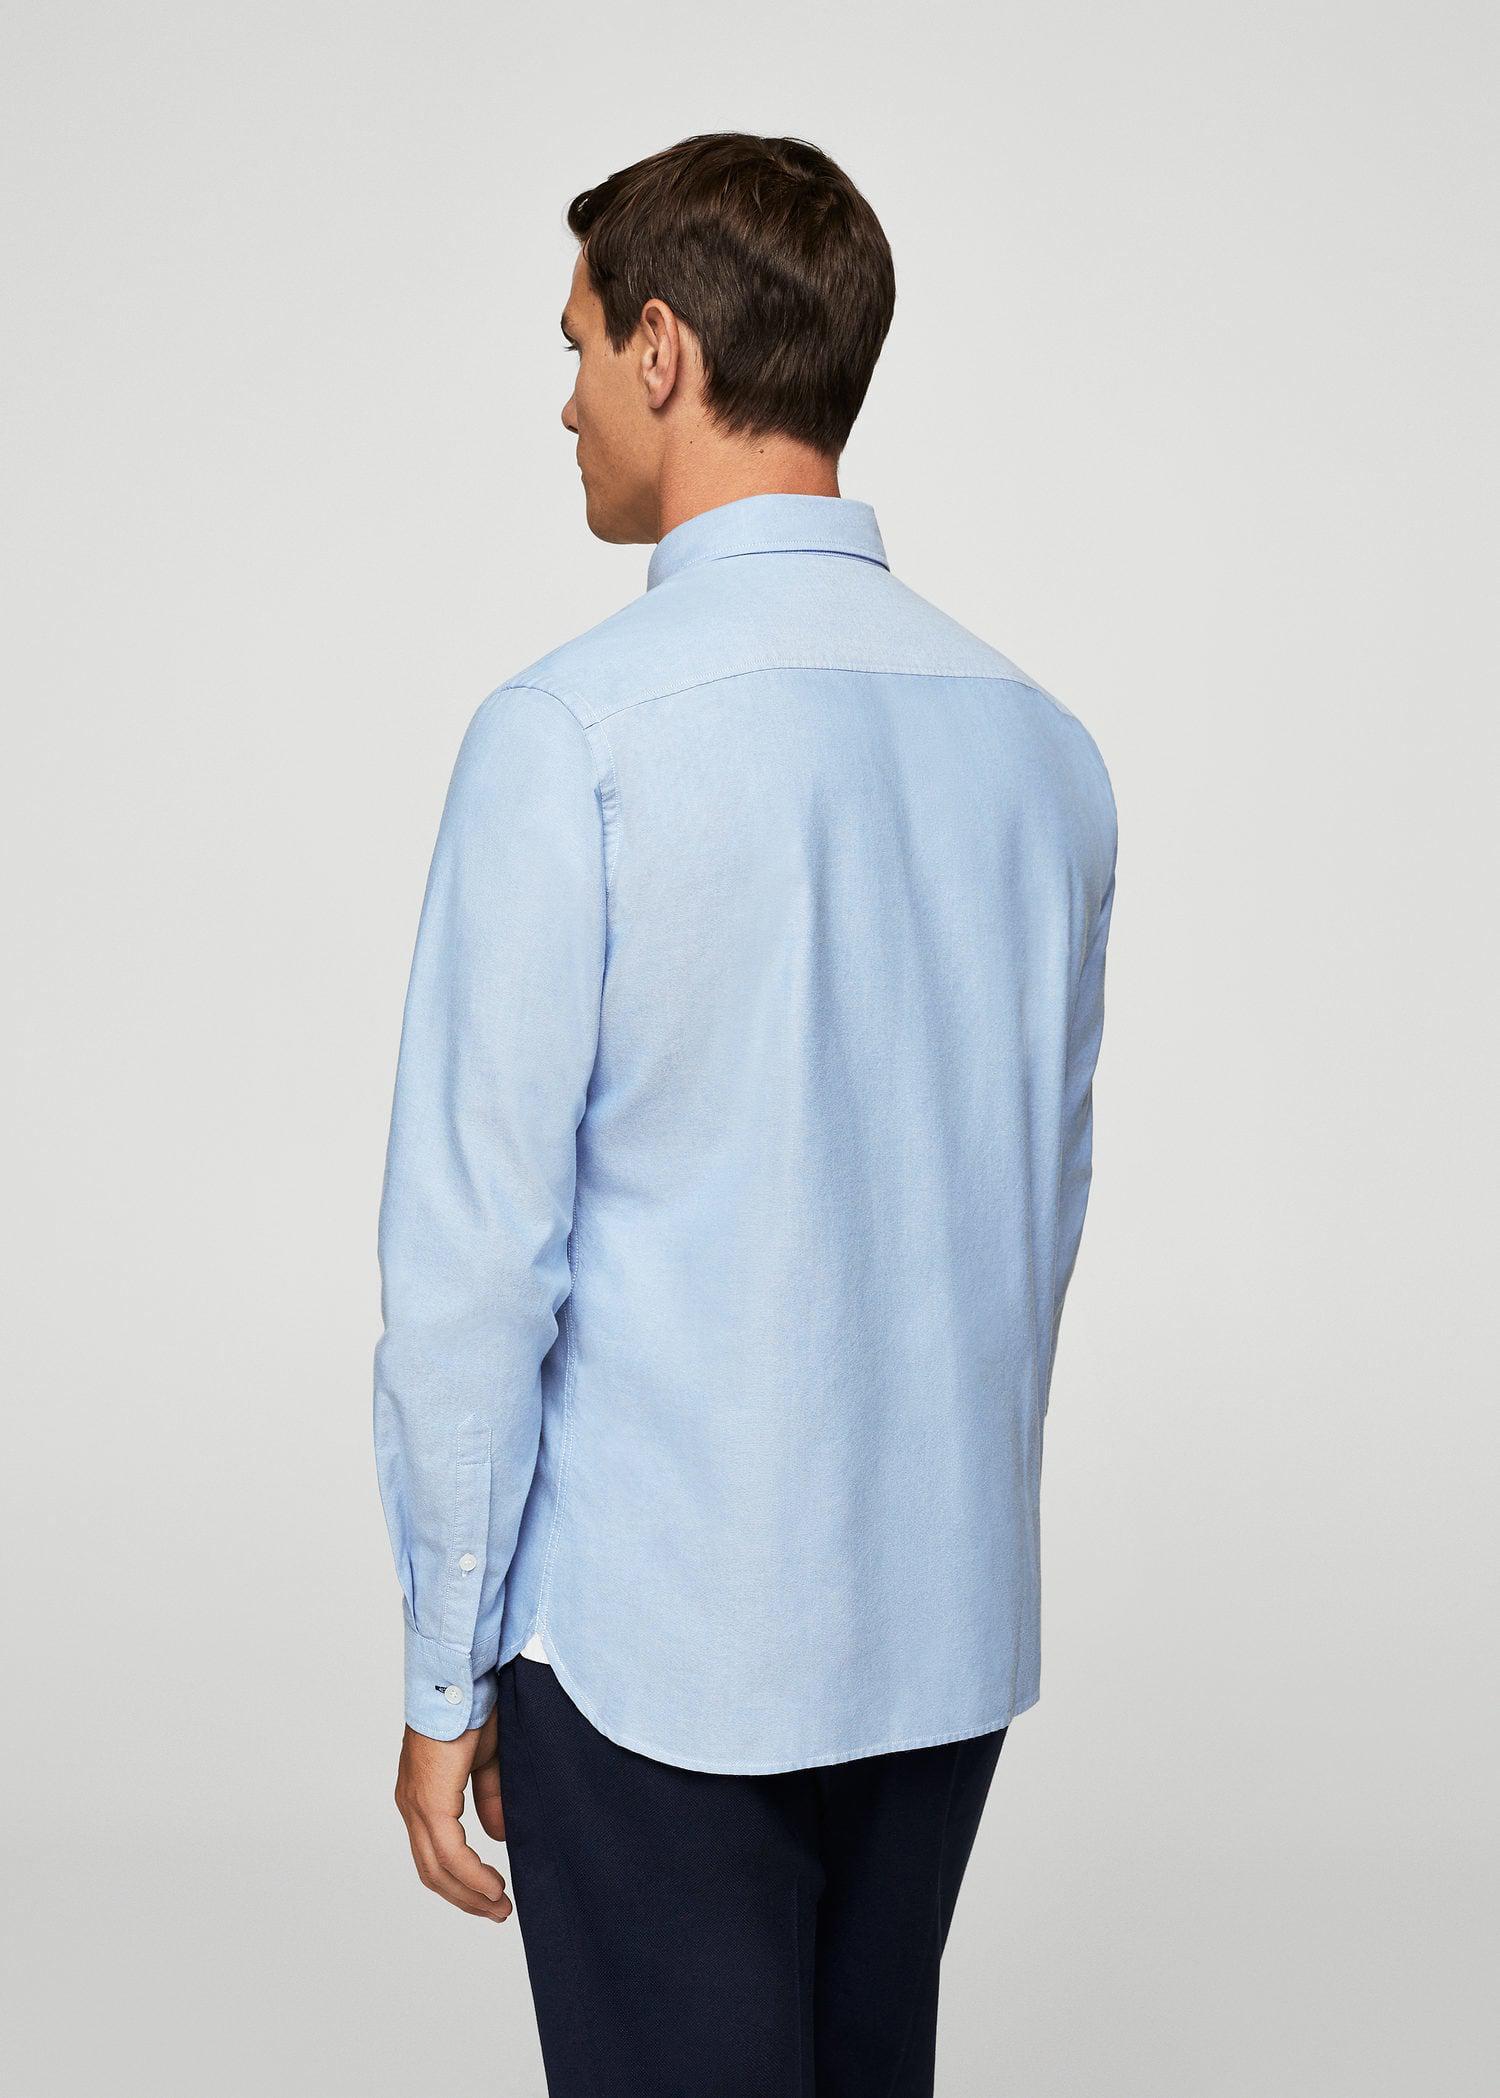 Mango Cotton Shirt in Sky Blue (Blue) for Men